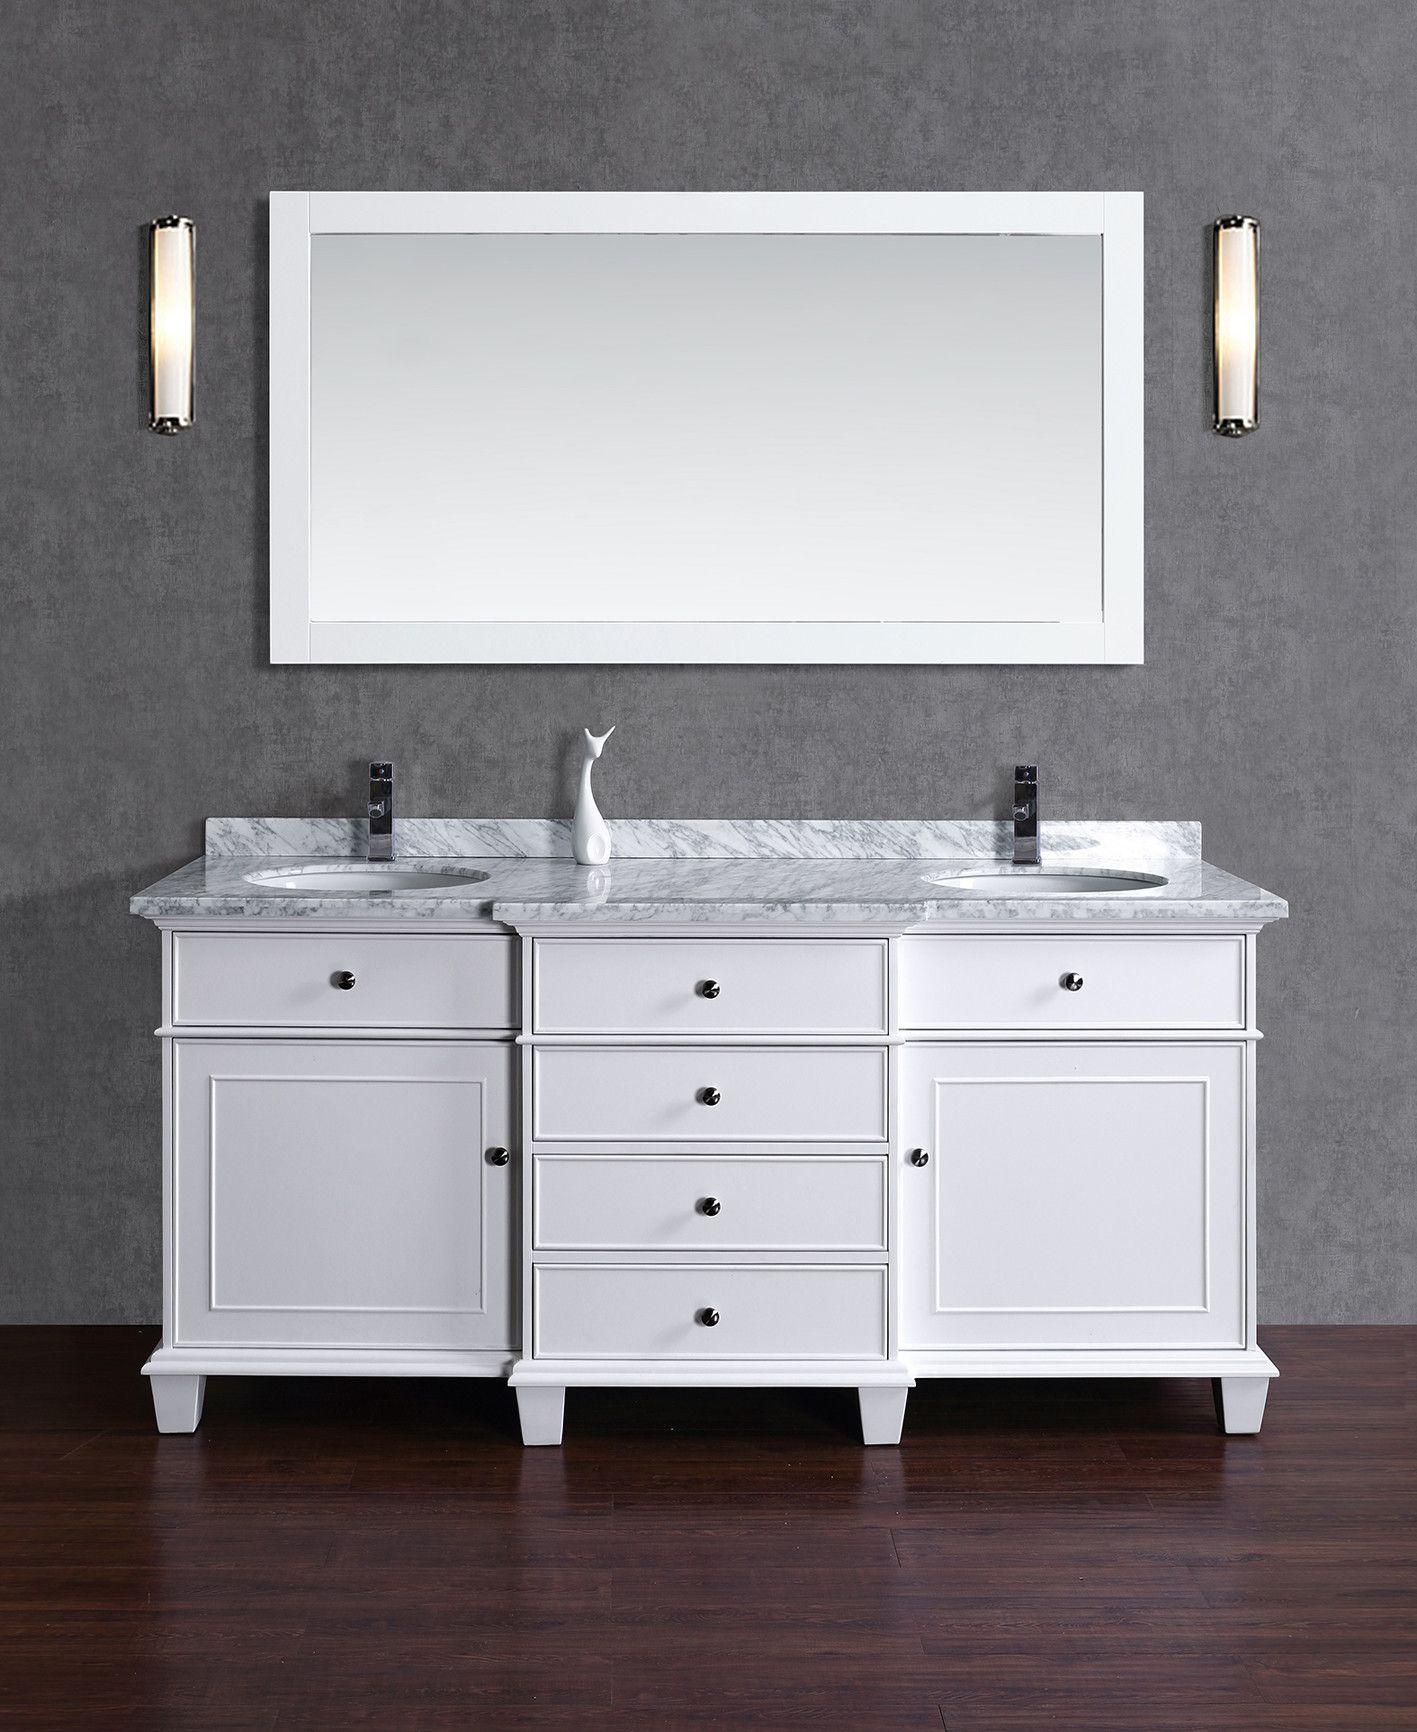 "Paris 60-Inch Espresso Double-Sink Bathroom Vanity With Mirrors alyn 72"" double bathroom vanity & mirror set | products"